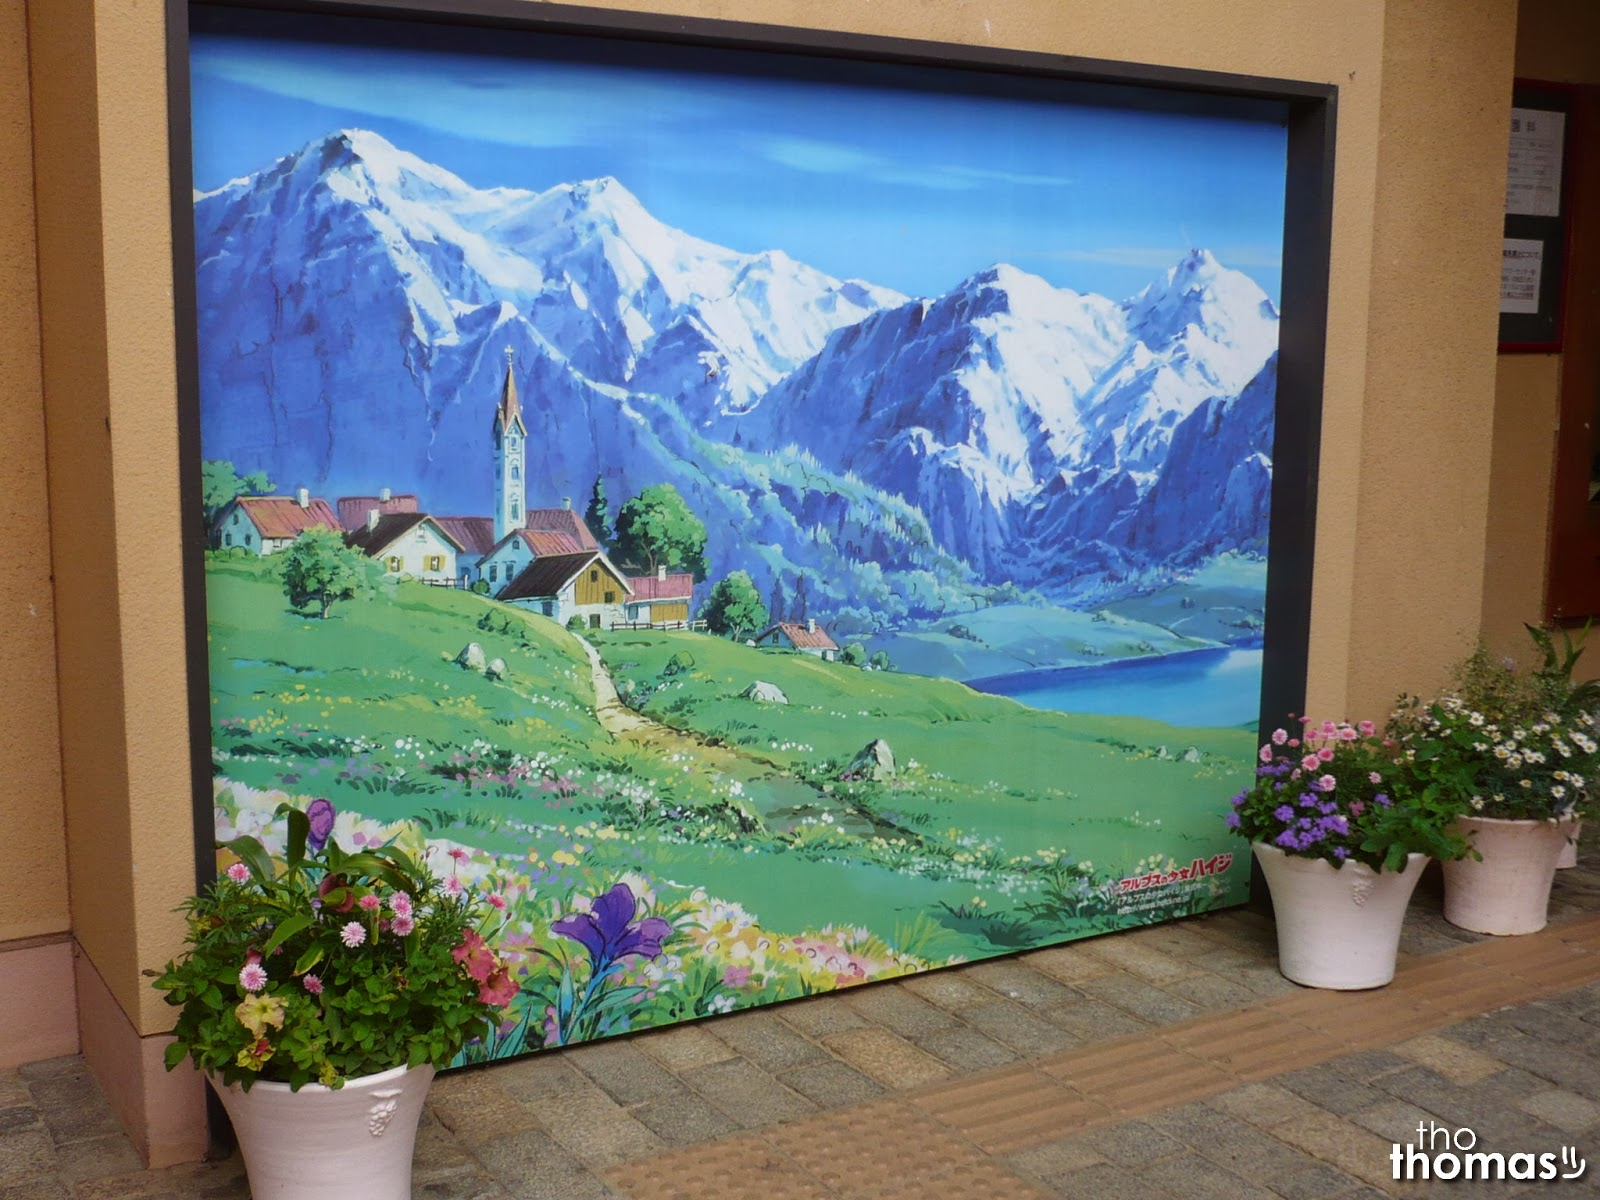 Tho's Dreams: 飄零燕莊園 - 優悠的瑞士小鎮